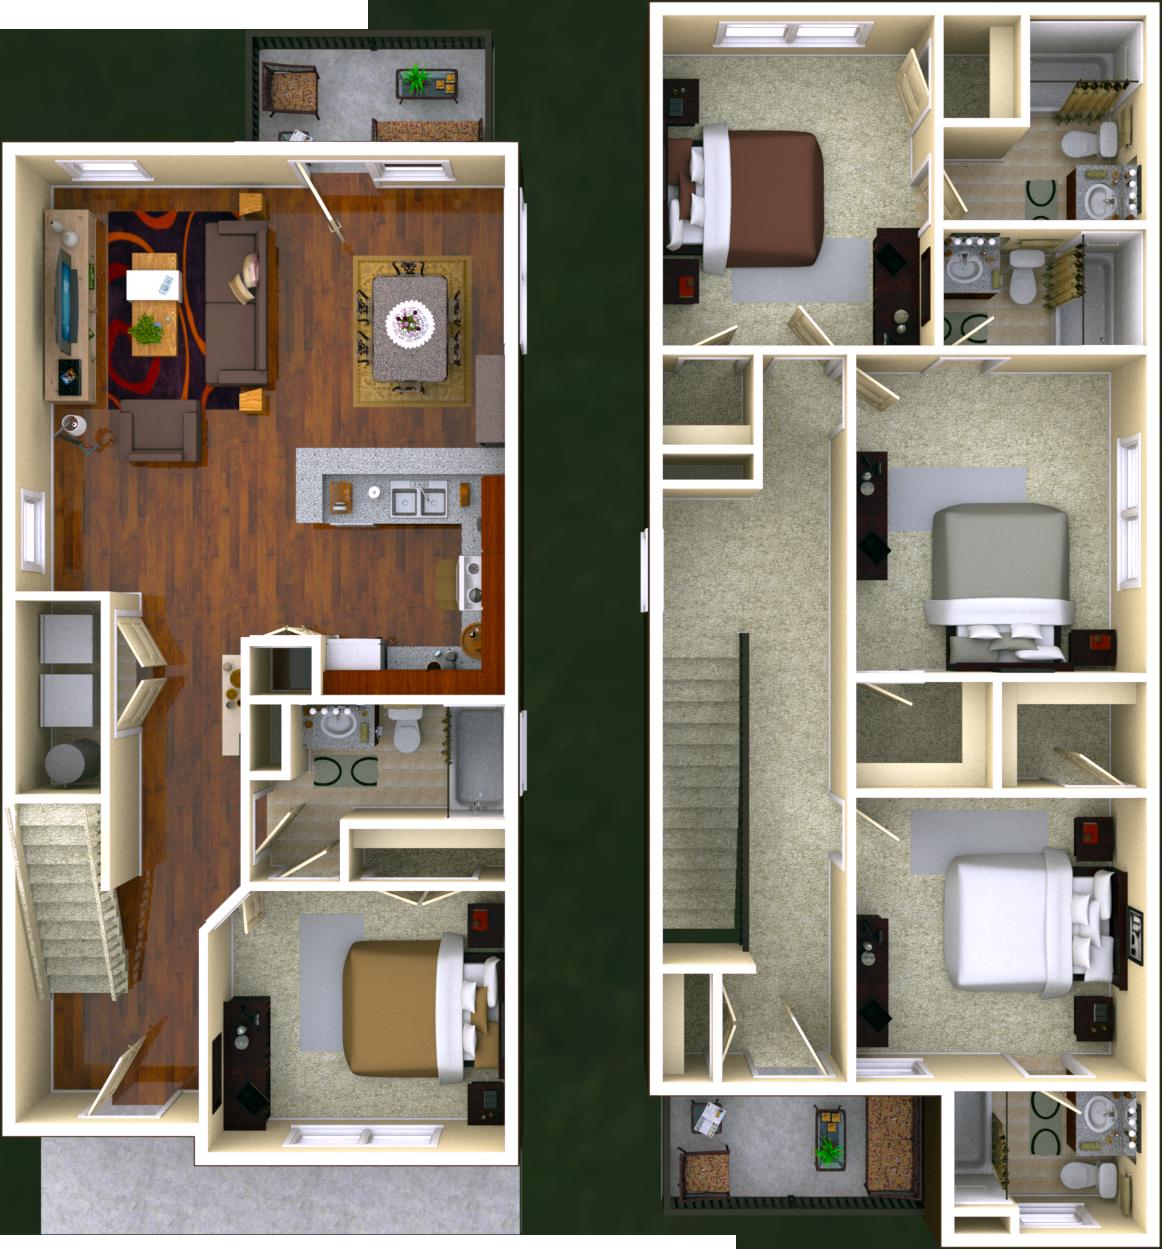 Bloomfield 4 BR 4 BATH Floor Plan